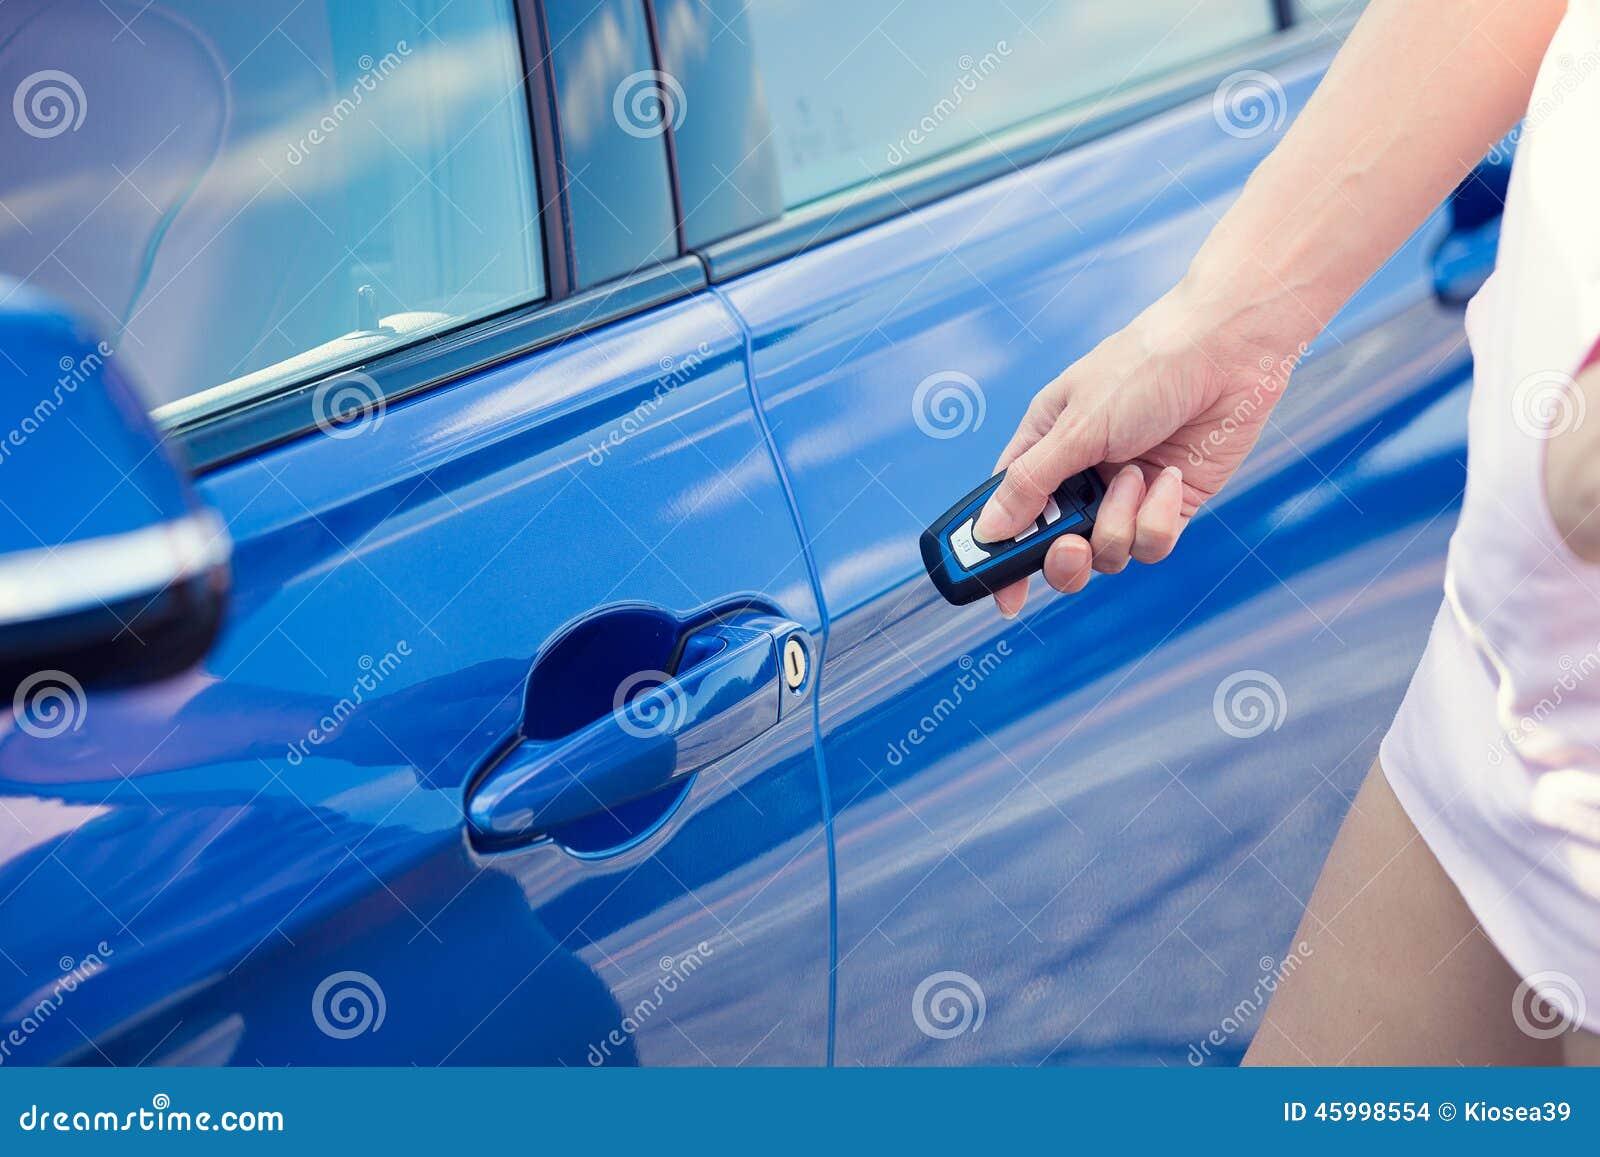 Women s hand presses on remote control unlocks car door